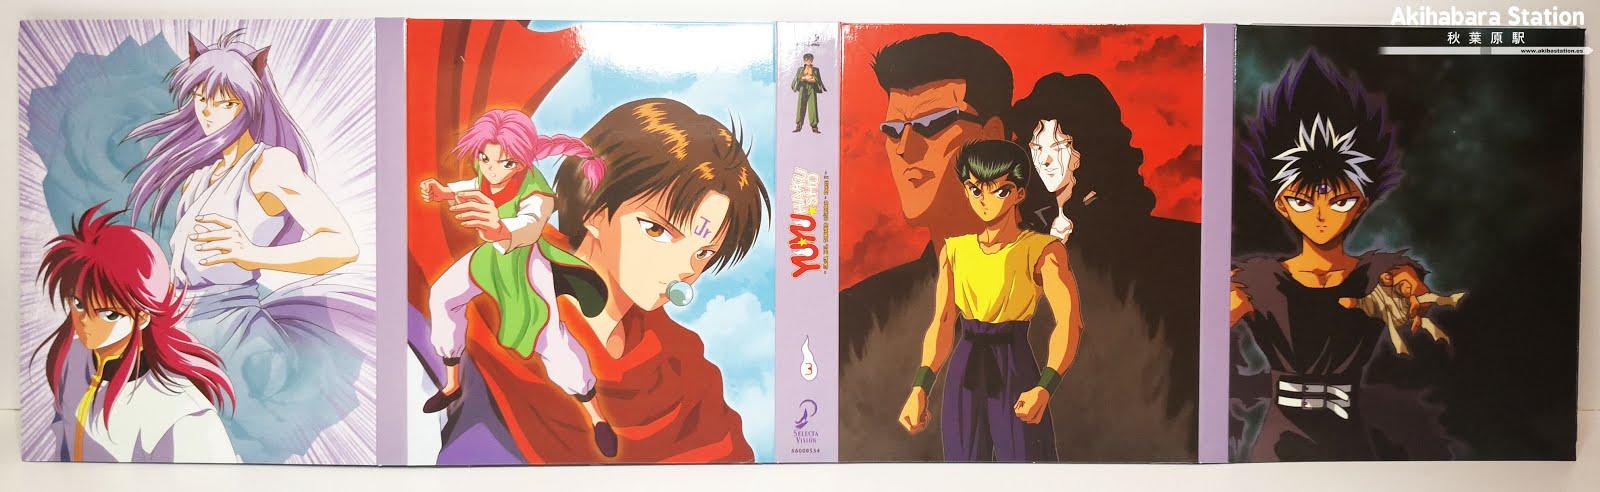 "Review de ""Yū Yū Hakusho"" Box.3 ed. Coleccionistas - SelectaVisión"